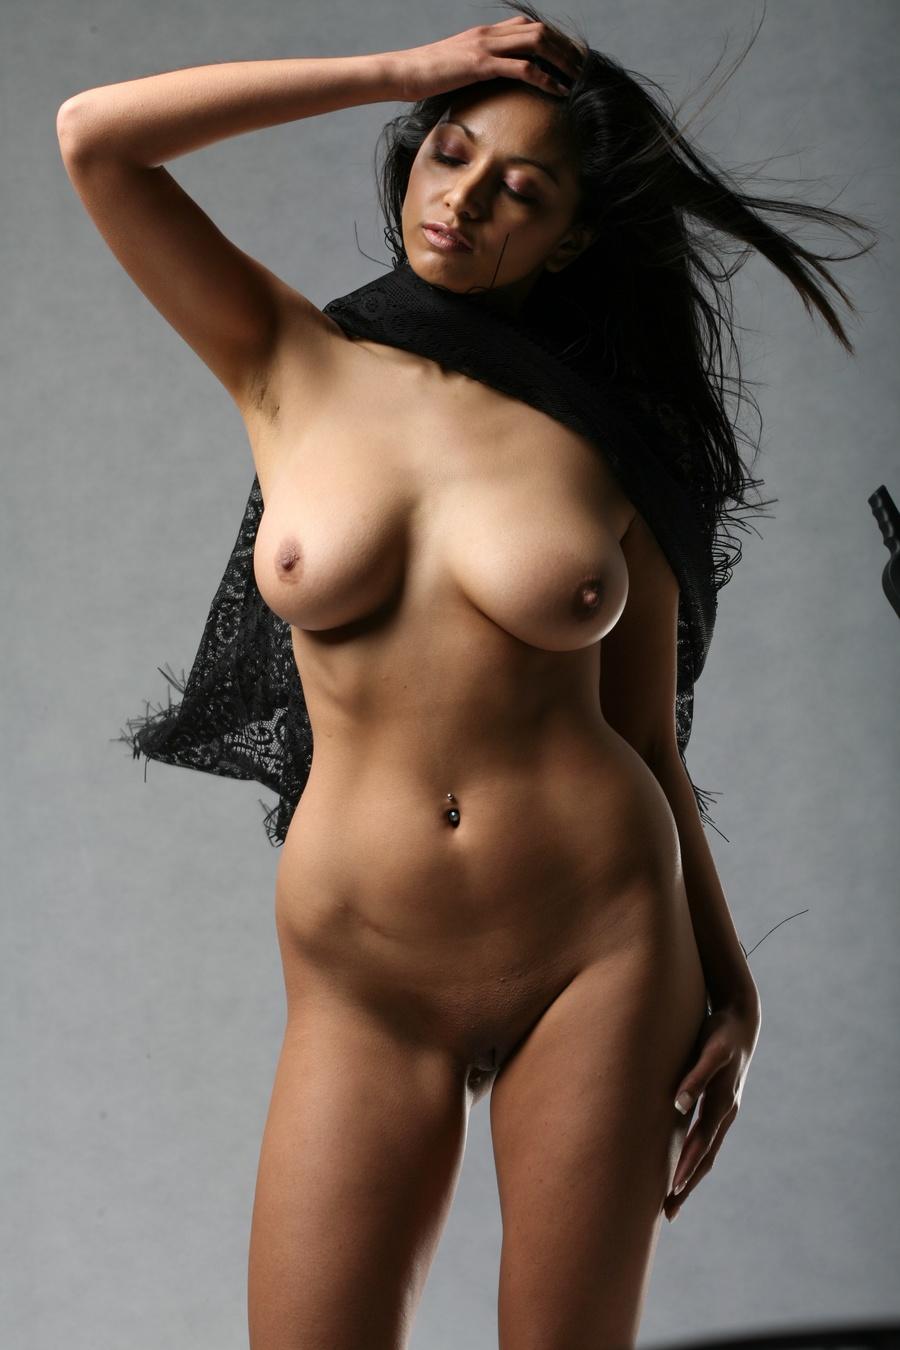 Downloading indian models nude images erotic scenes